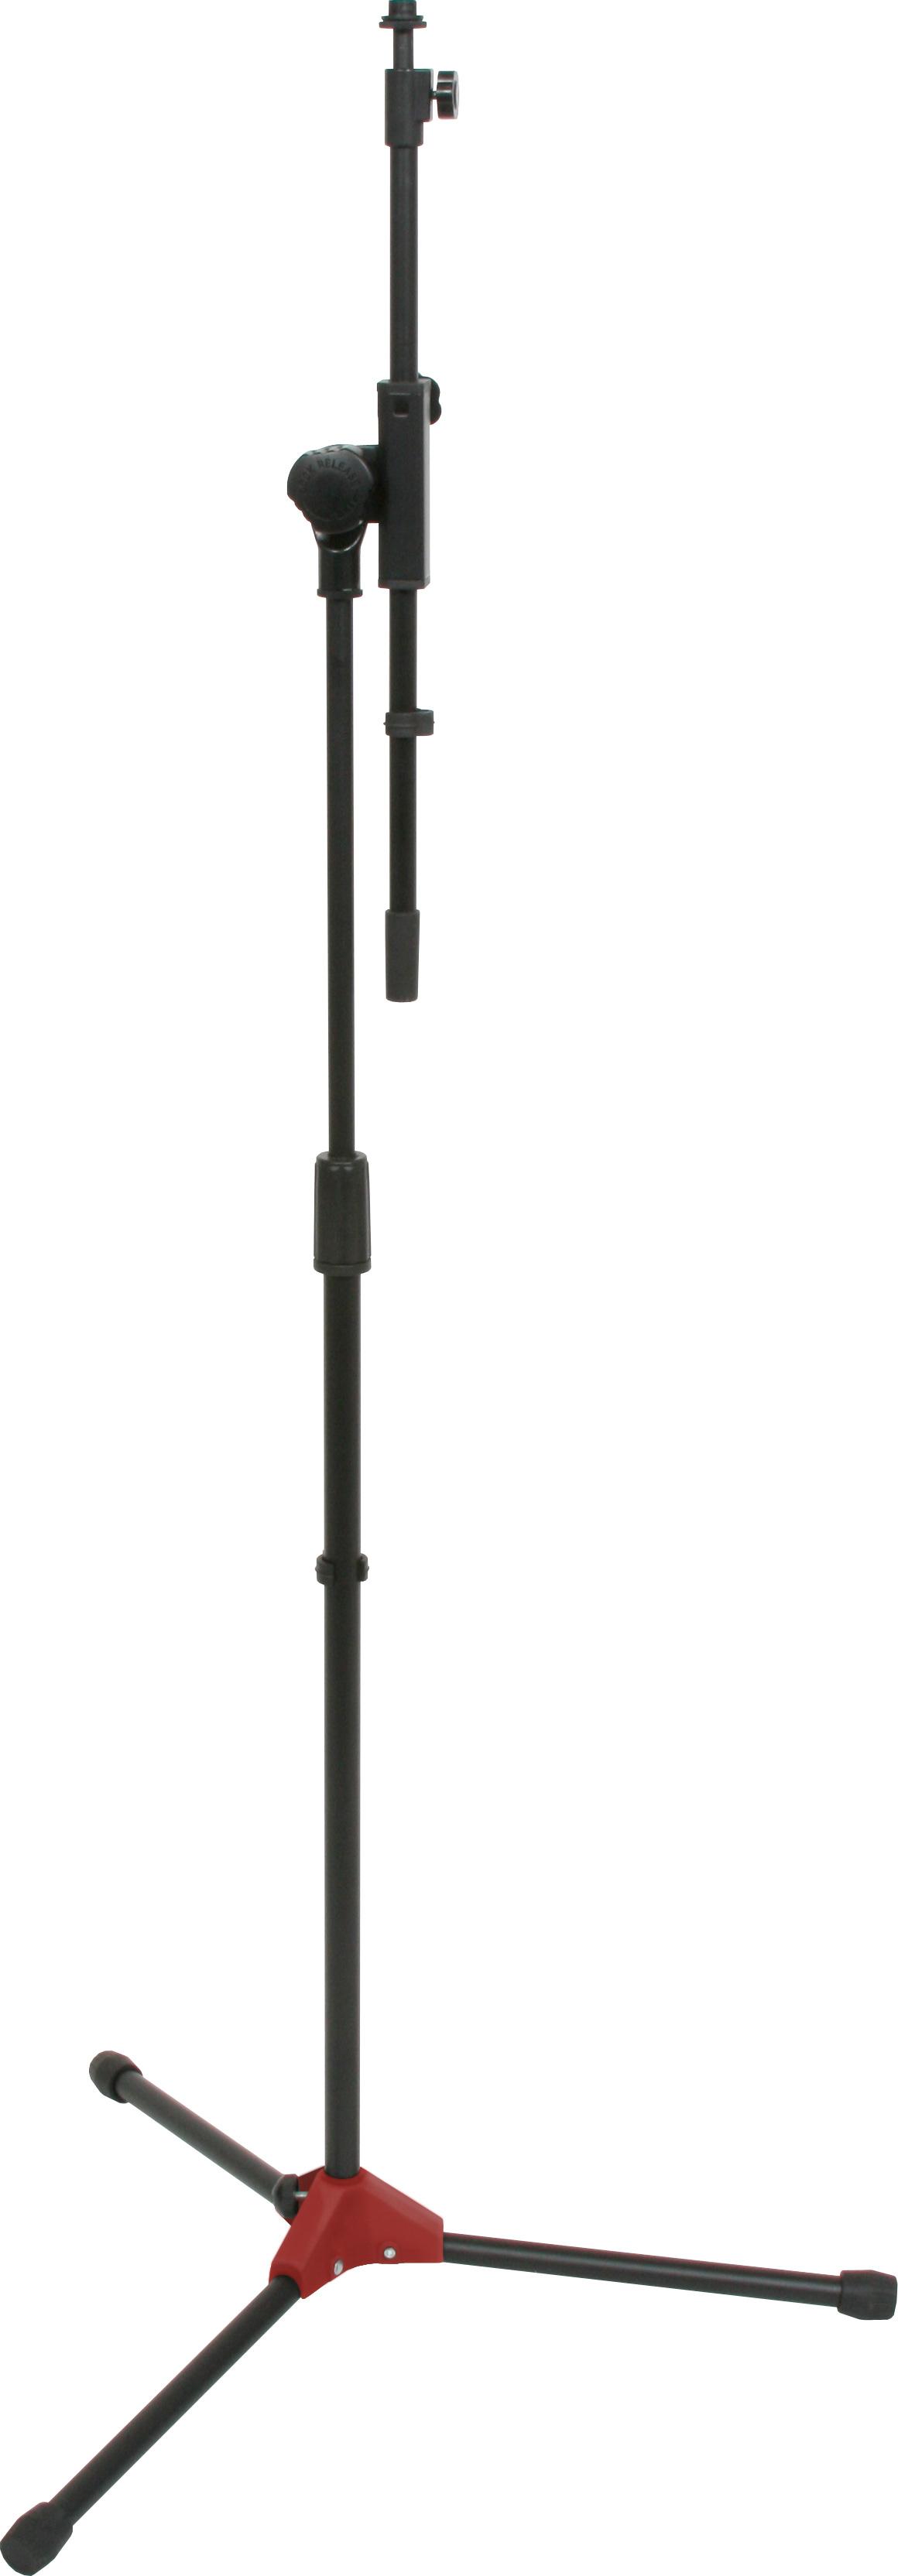 Galaxy Audio Mst 25 Mic Stand